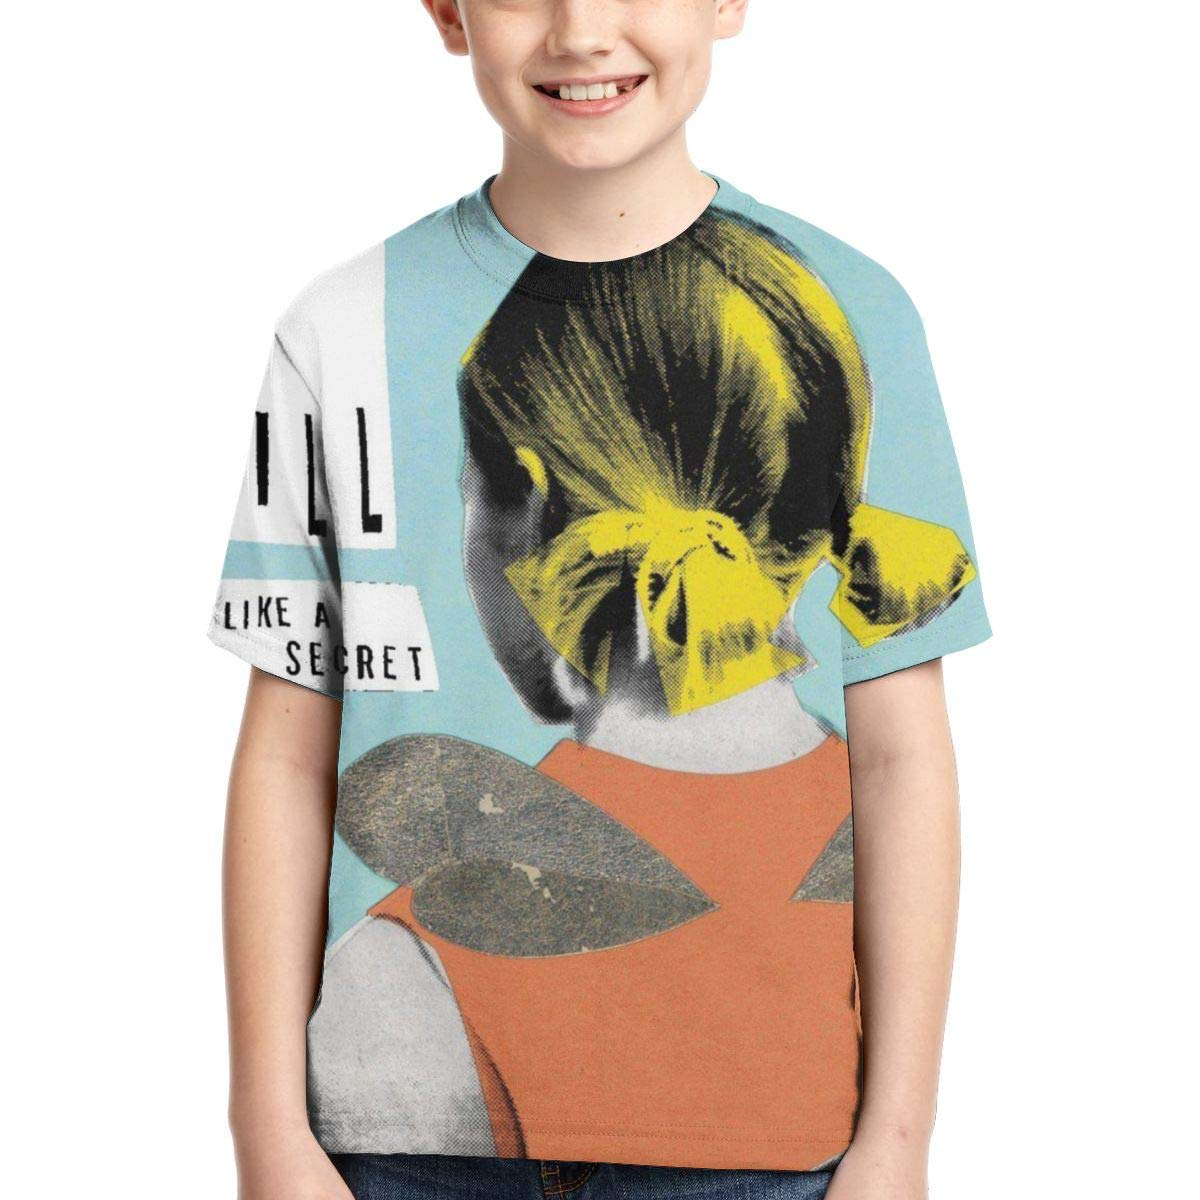 BowersJ Childs Built to Spill Keep It Like A Secret Design 3D Printed Short Sleeve T Shirts for Girls /& Boys Black